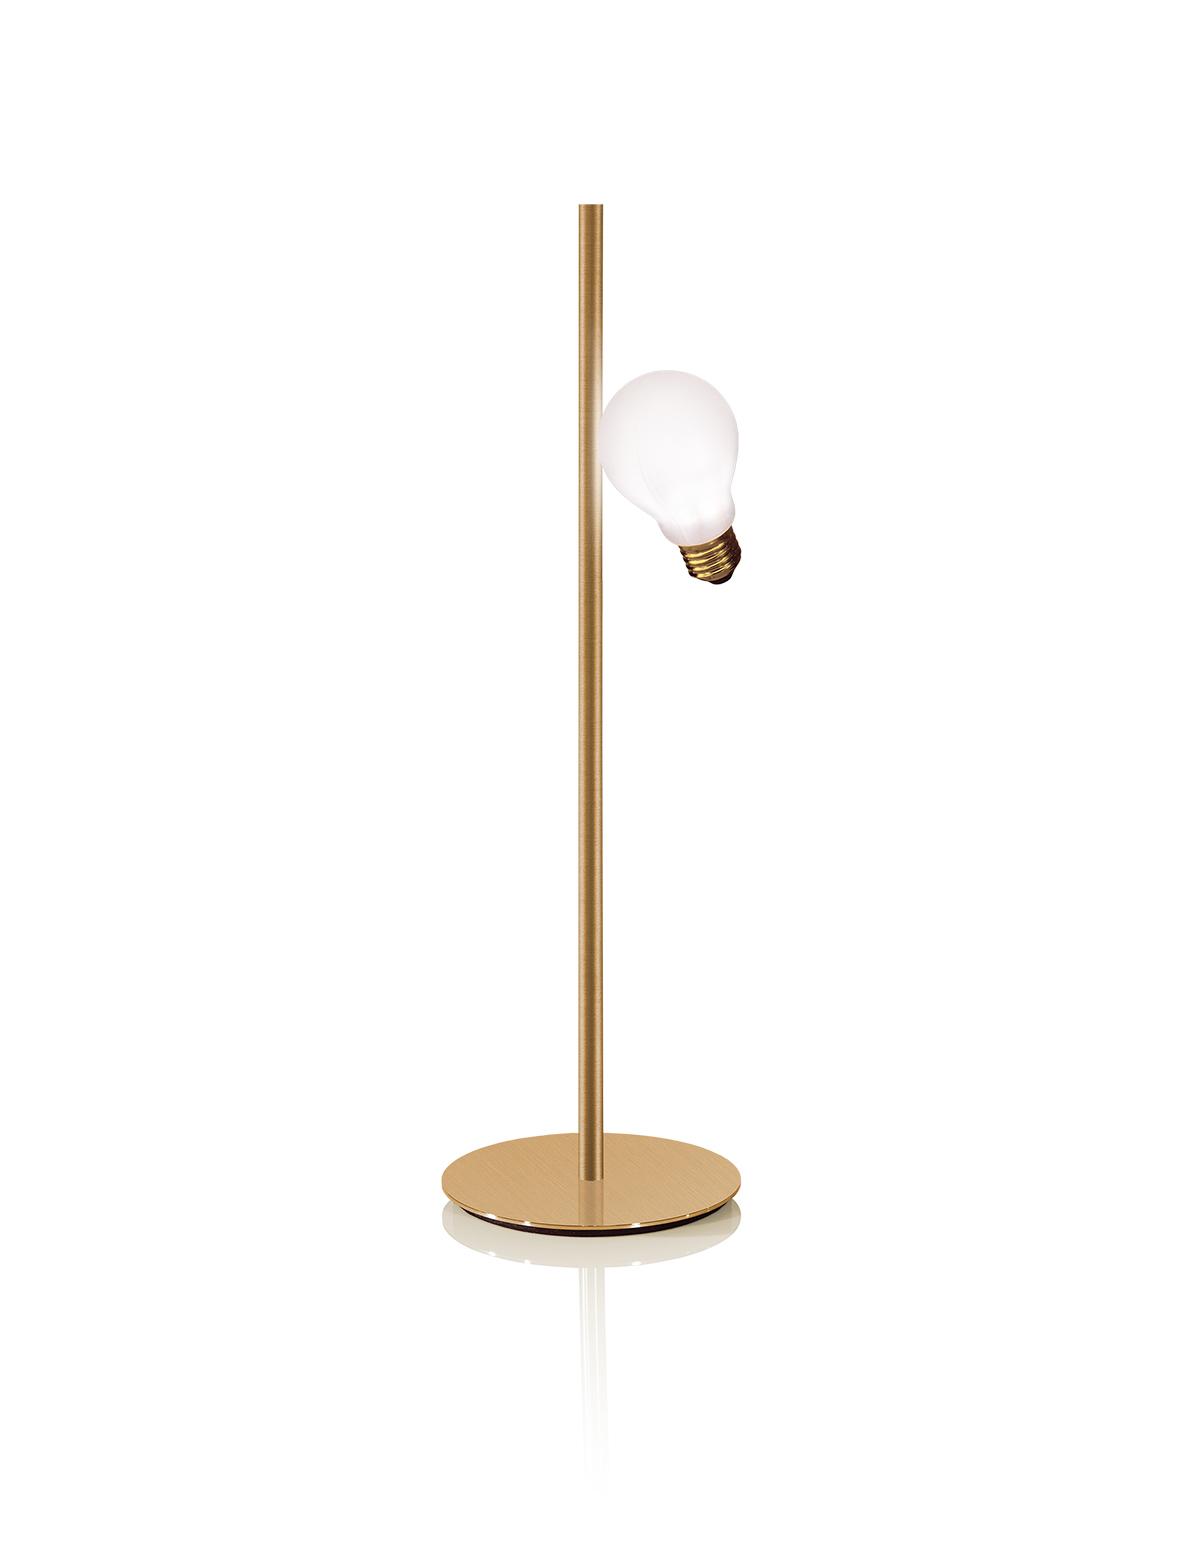 IDEA - Marcantonio design